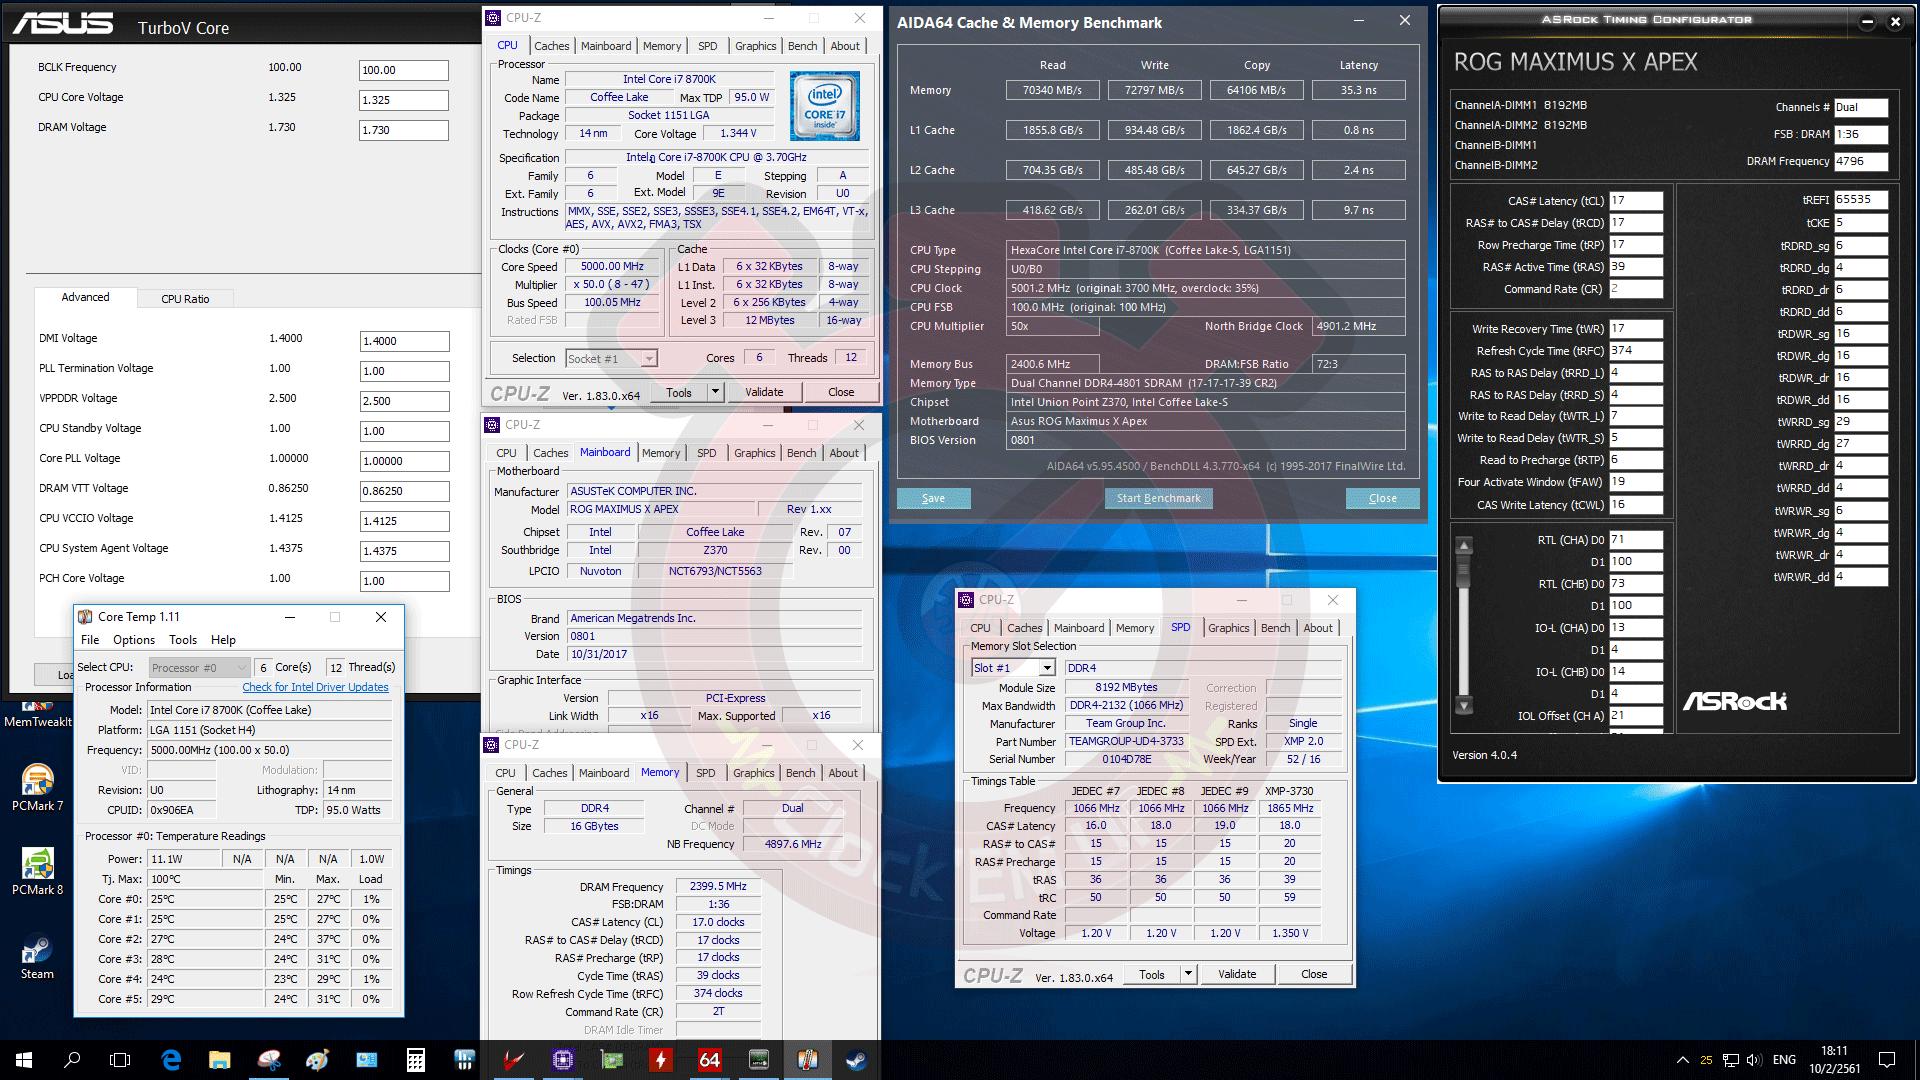 Ultimate Samsung B-Die DDR4 @ 4800CL17-17-17-39 Dual-CH on